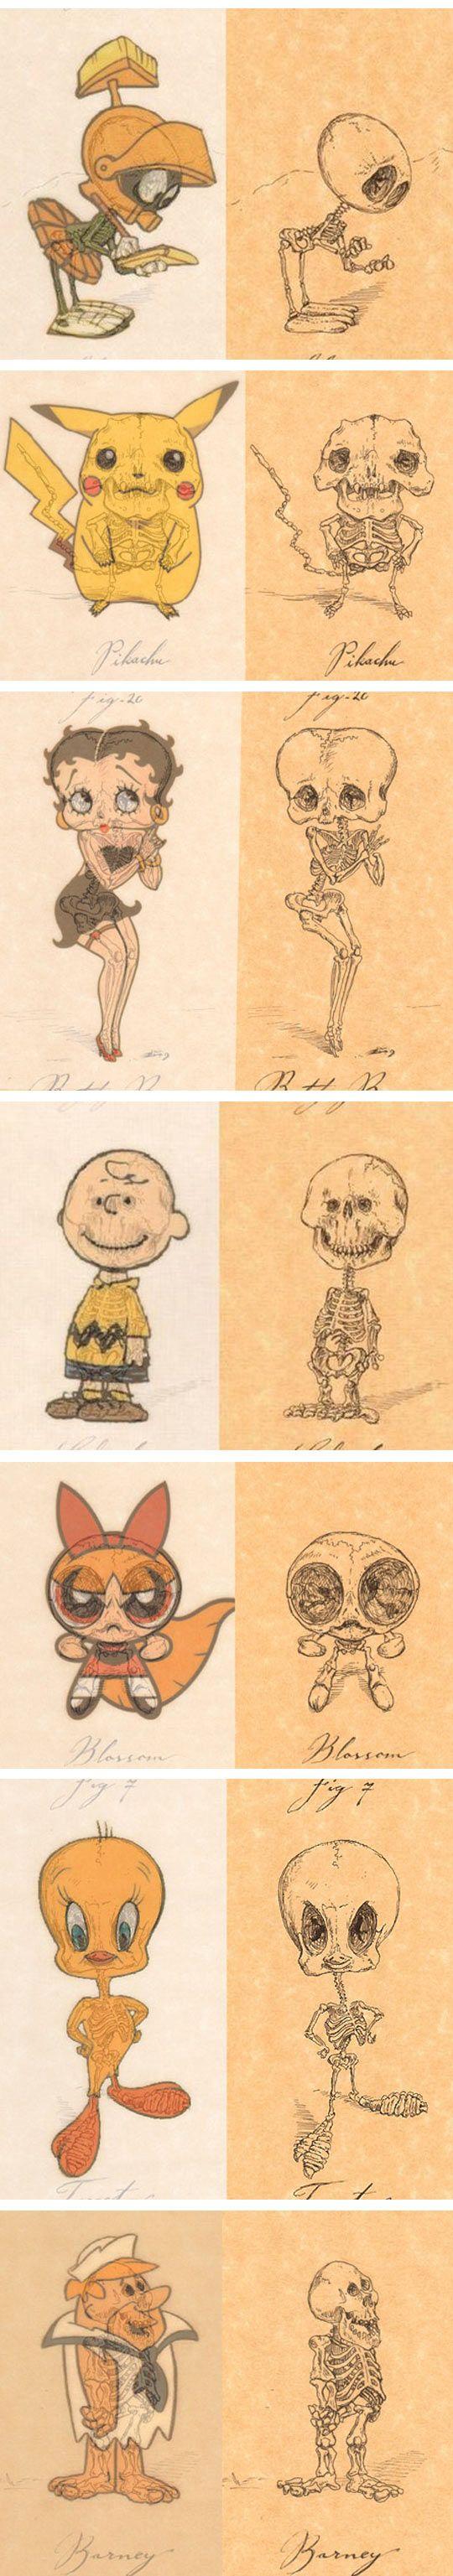 Anatomy of Cartoon Characters